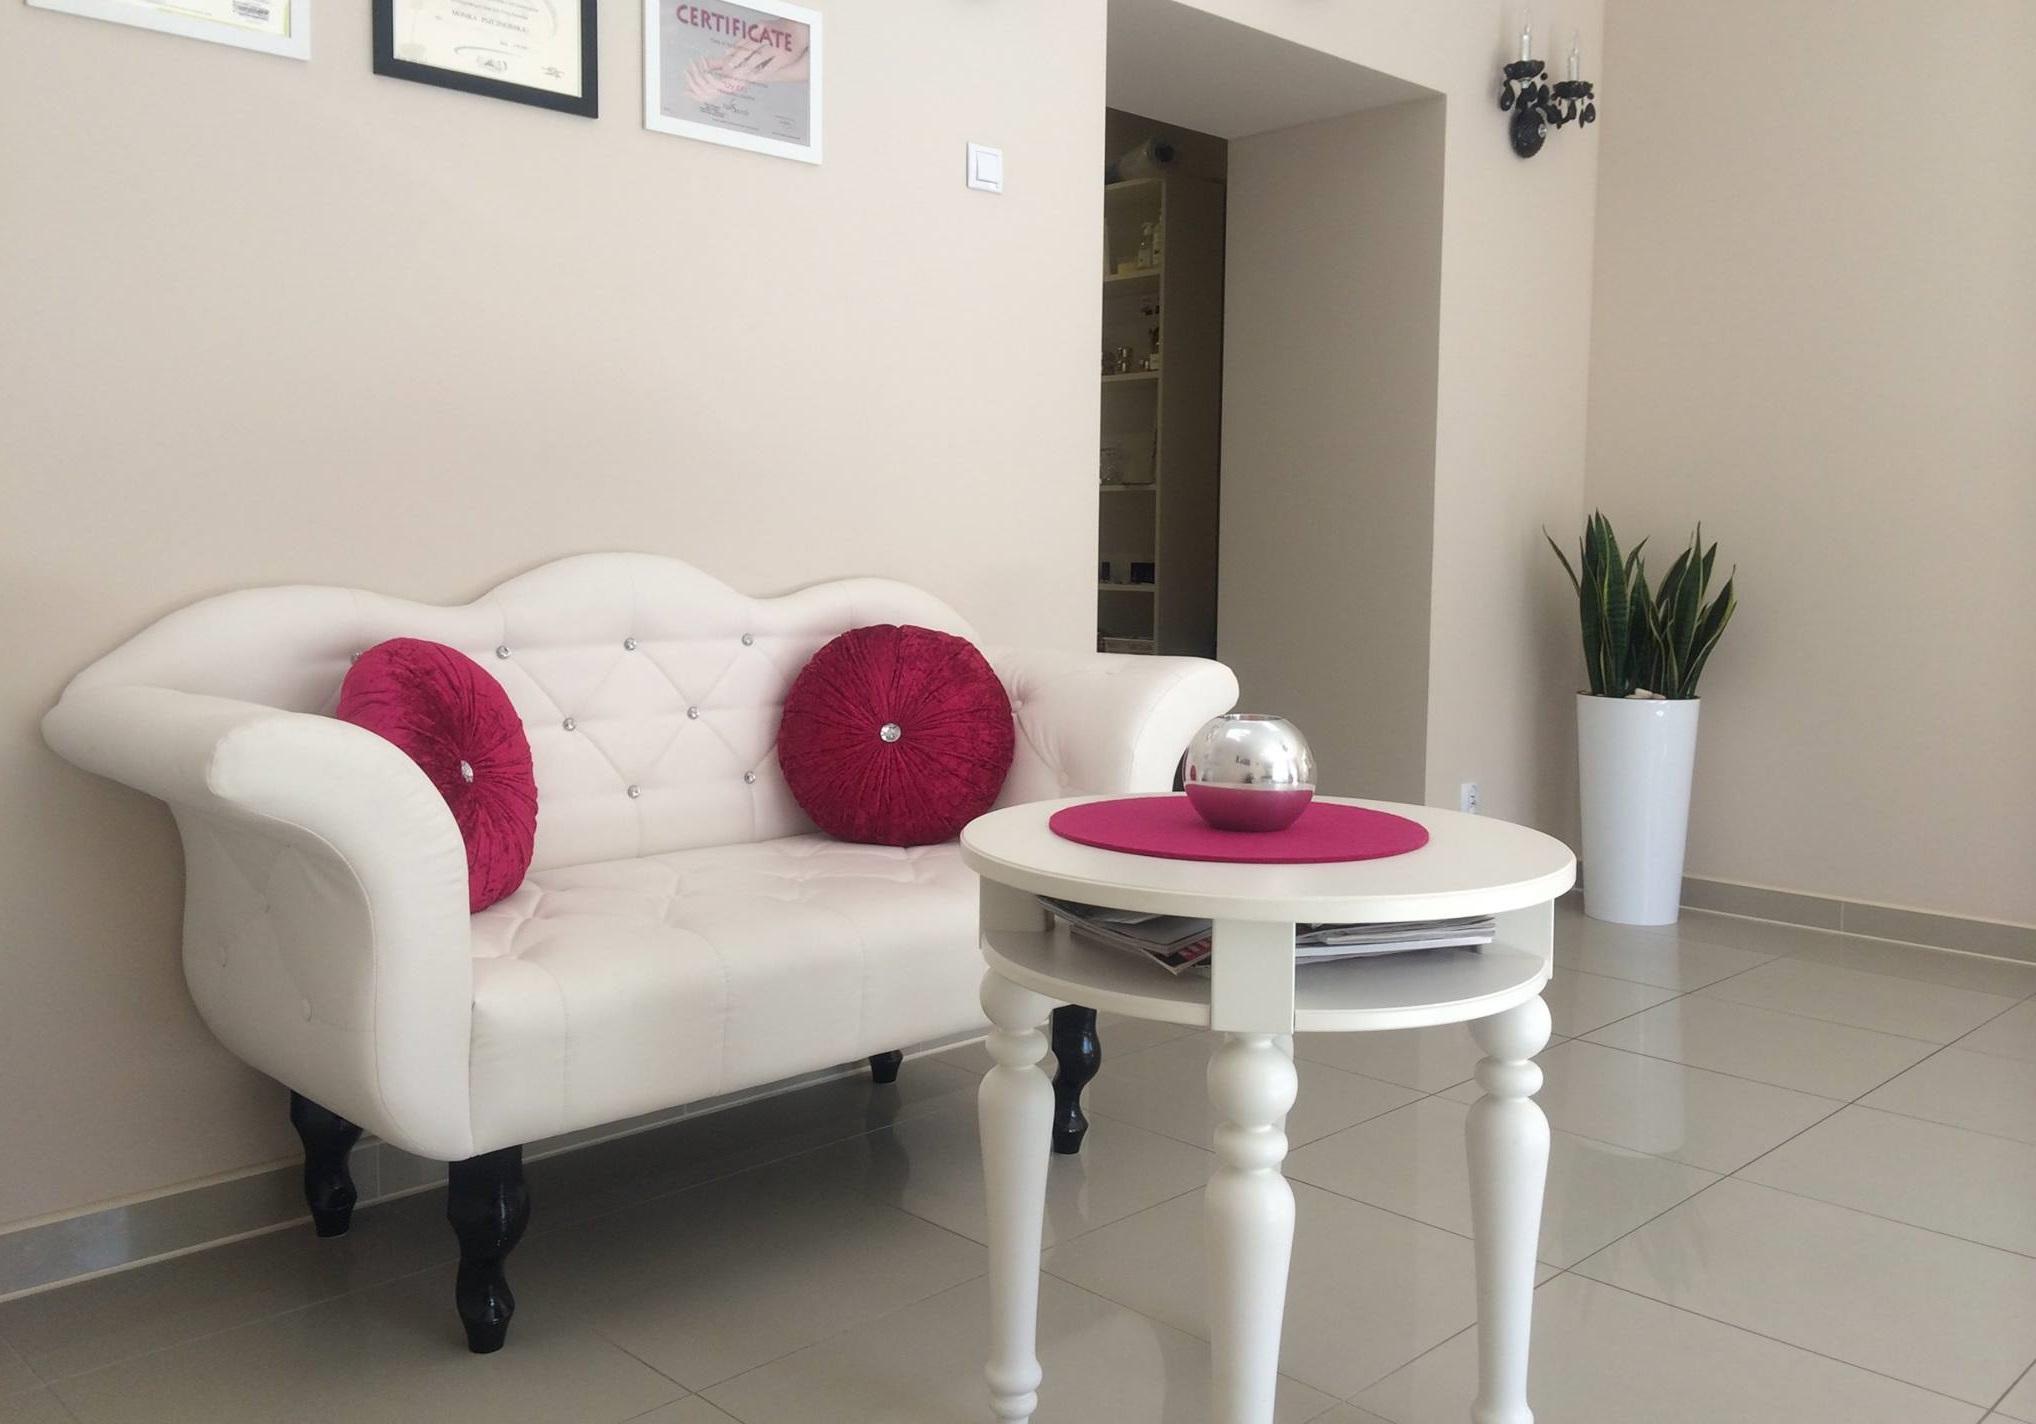 Full Size of Sofa Antik Chesterfield Gebraucht Couch Kaufen Schweiz Sofas Bali Antiklederoptik 2 Sitzer Antiksofa Polstersofa Azurro Wei Rot Vitra Verkaufen 5 Mit Sofa Sofa Antik